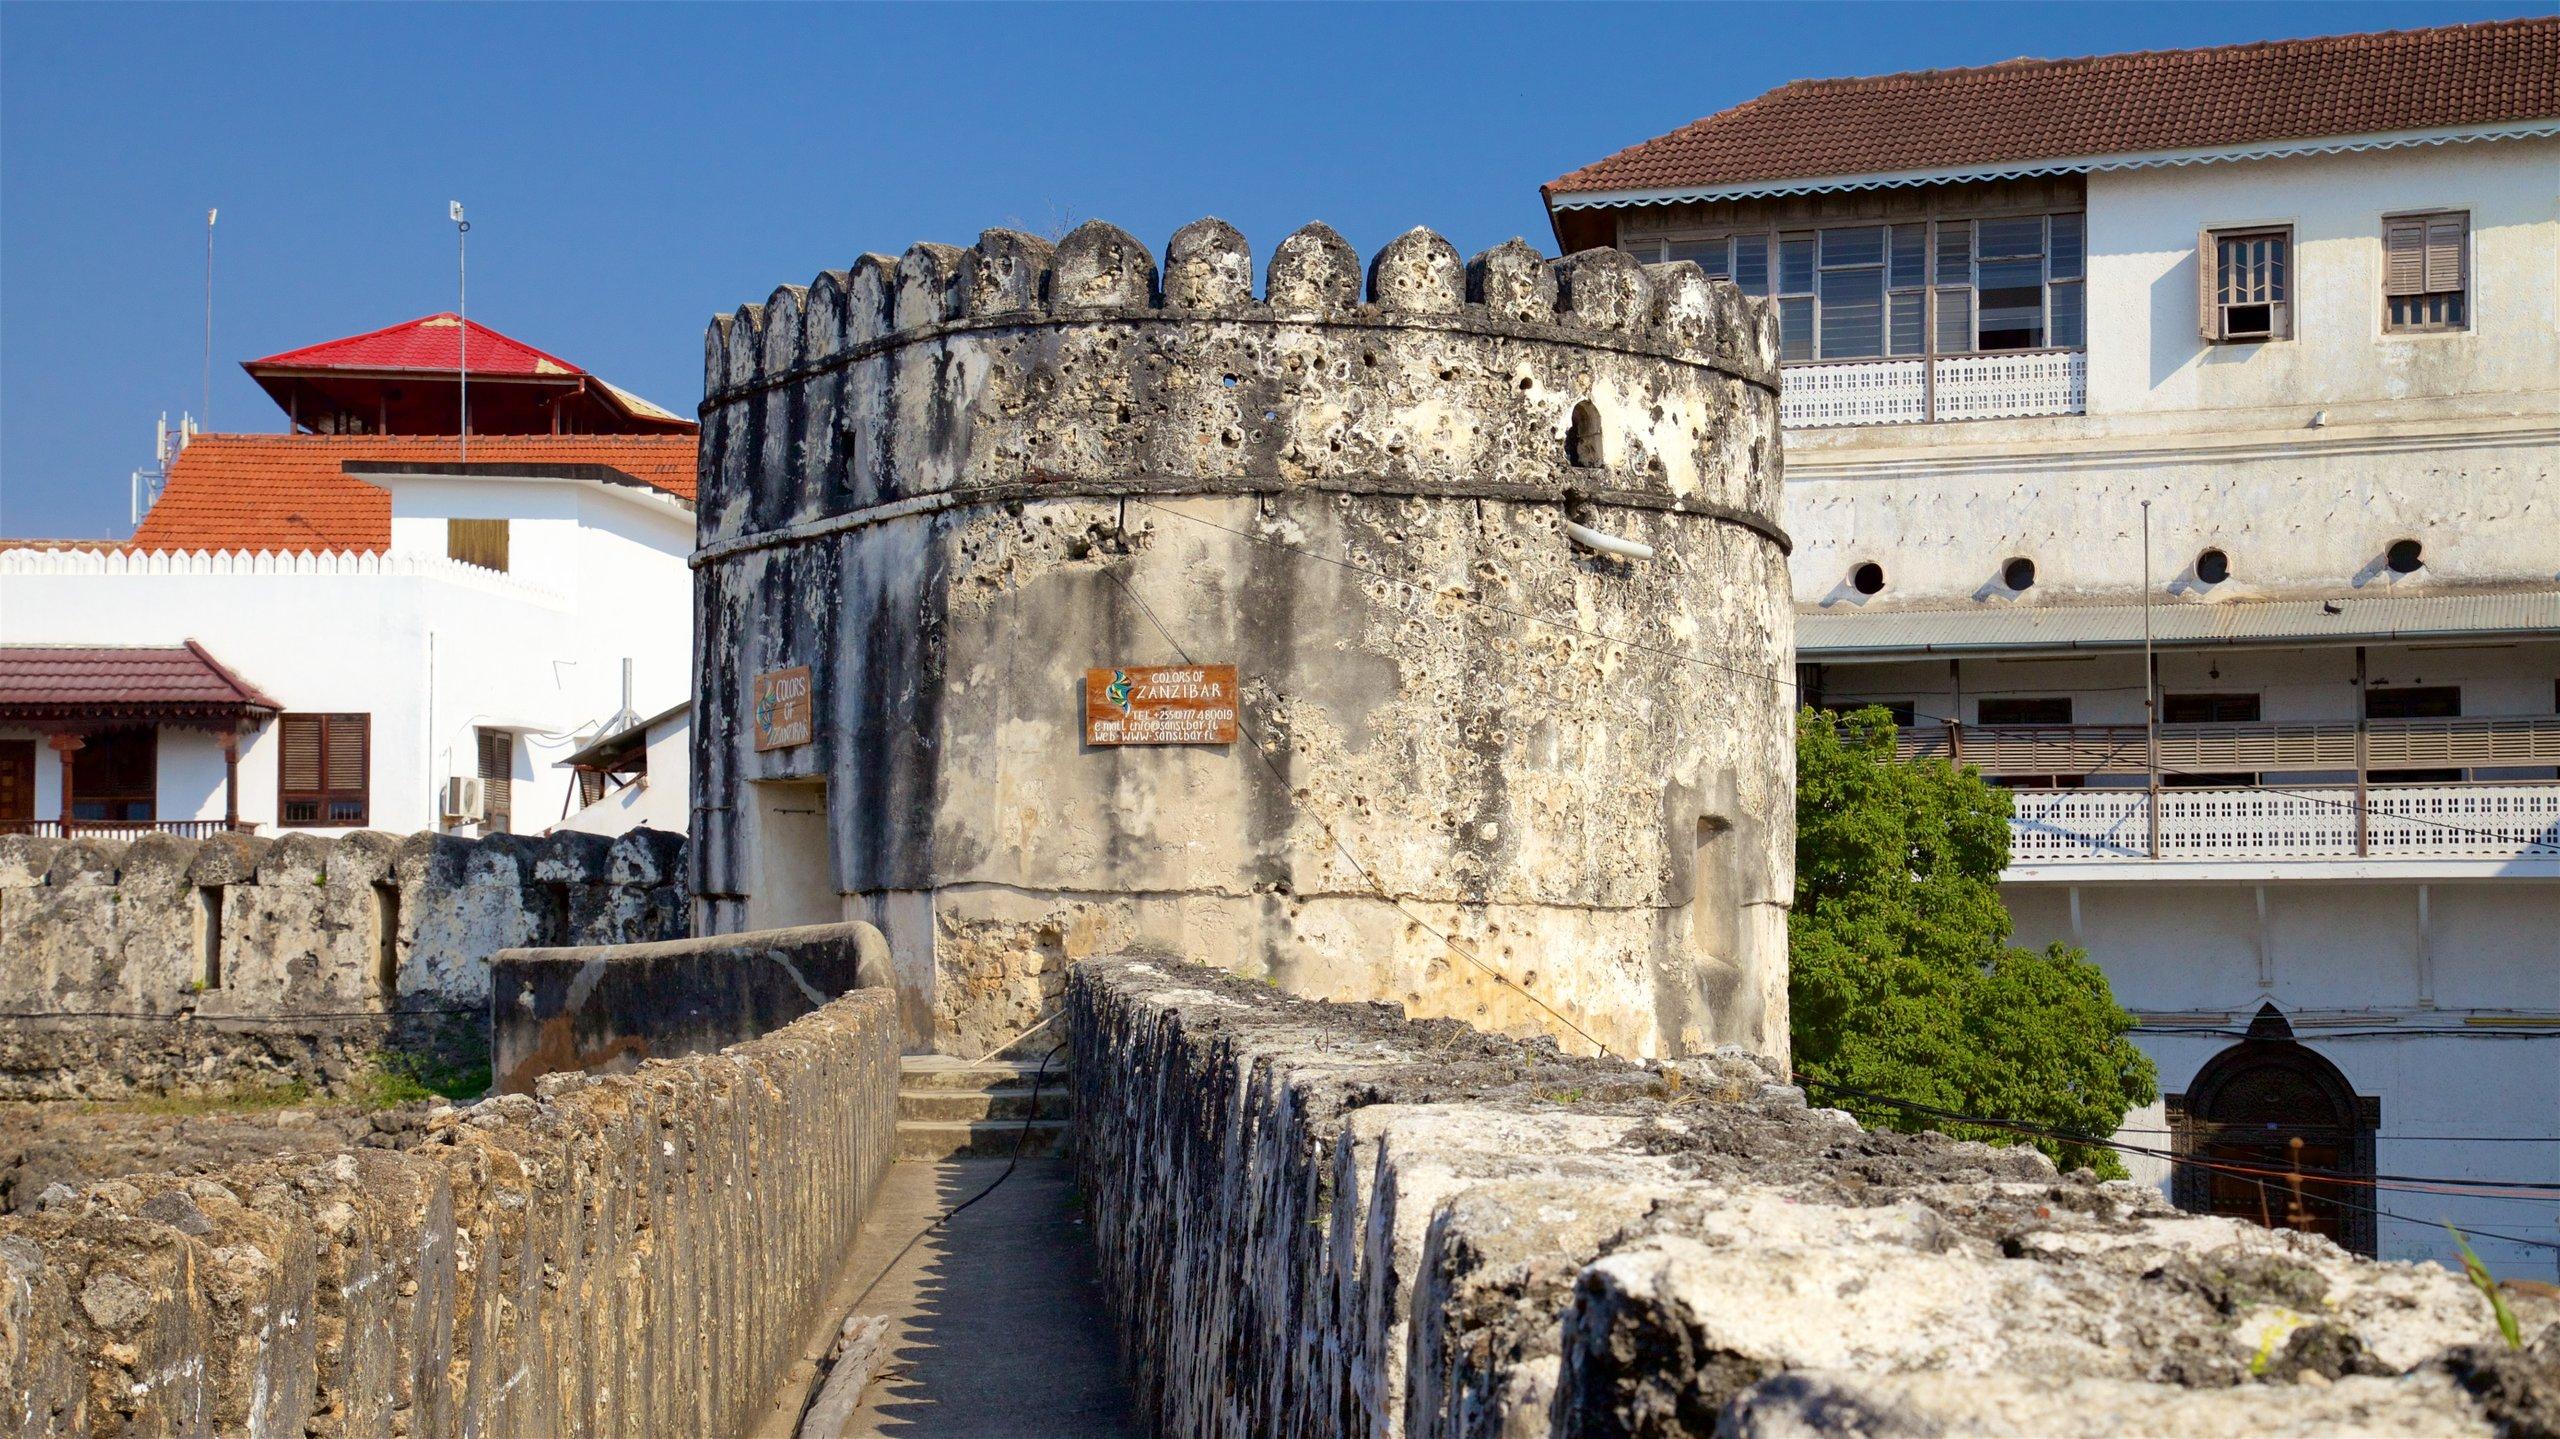 Stone Town, Zanzibar Town, Mjini Magharibi Region, Tanzania